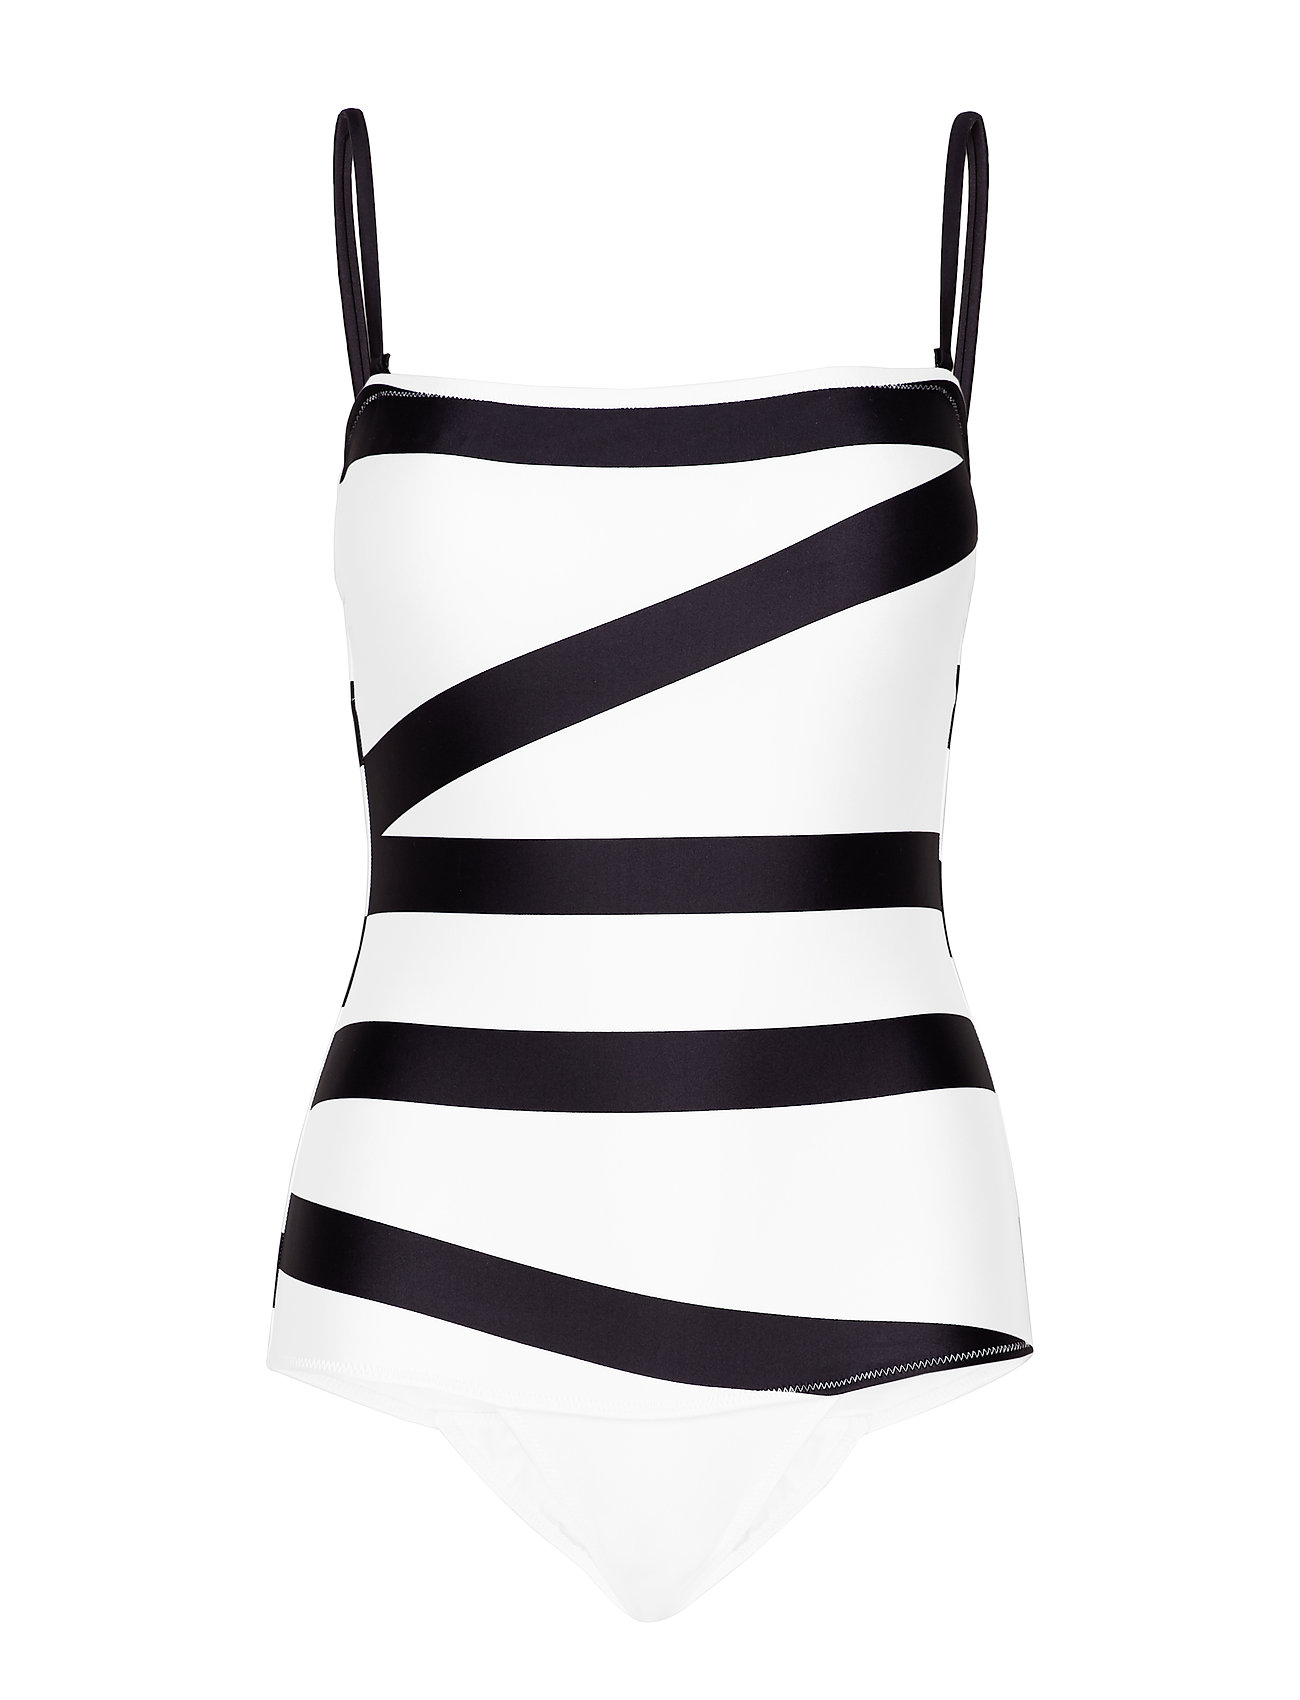 Calvin Klein BANDEAU ONE PIECE - KLEIN ABSTRACT WHITE